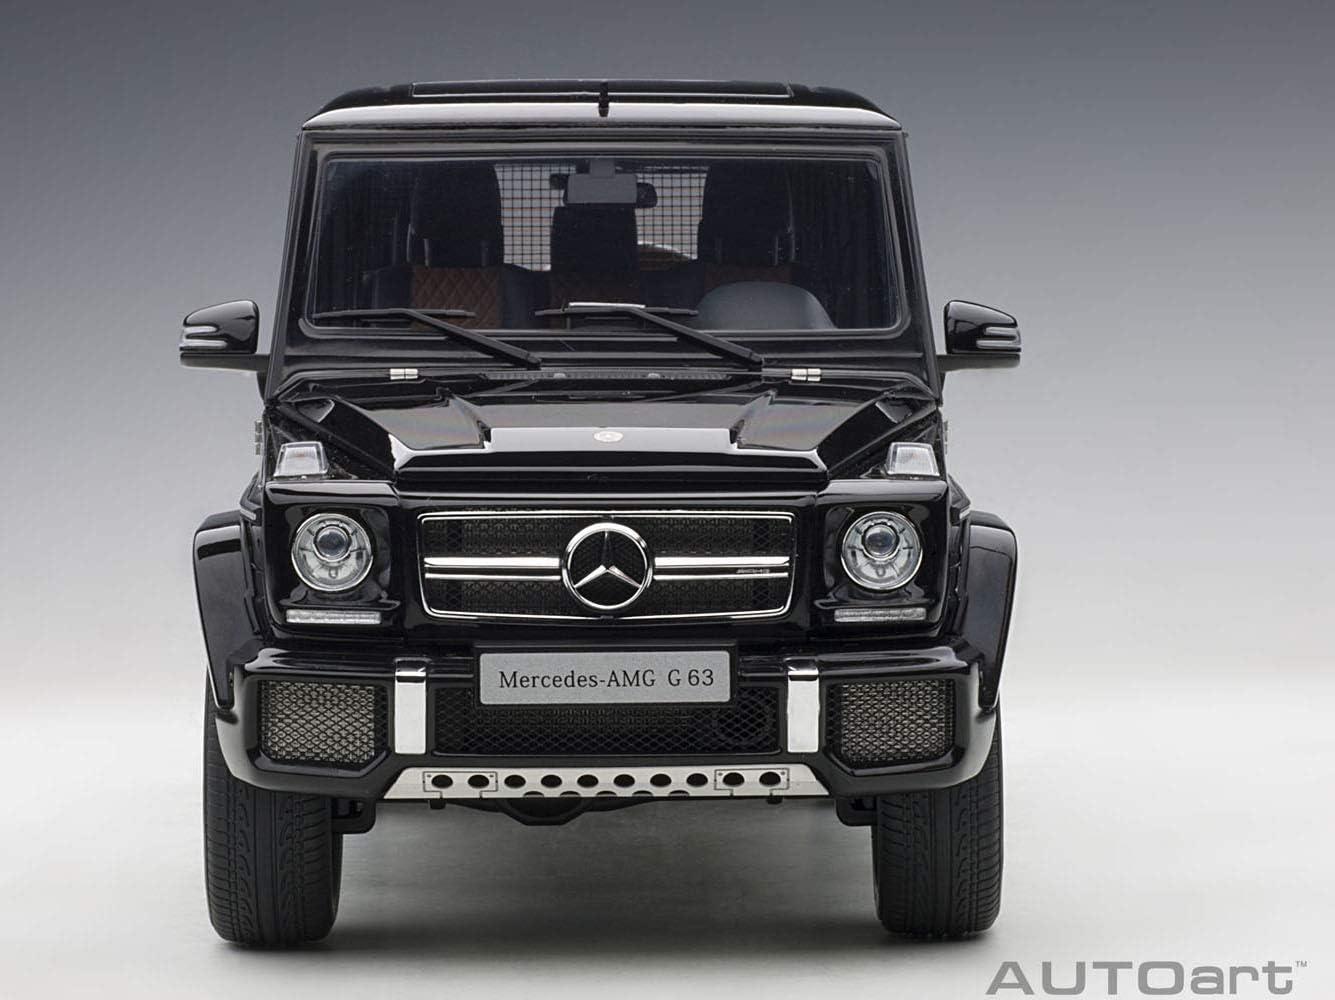 Mercedes AMG G 63 Gloss Black 1//18 Model Car by Autoart 76322